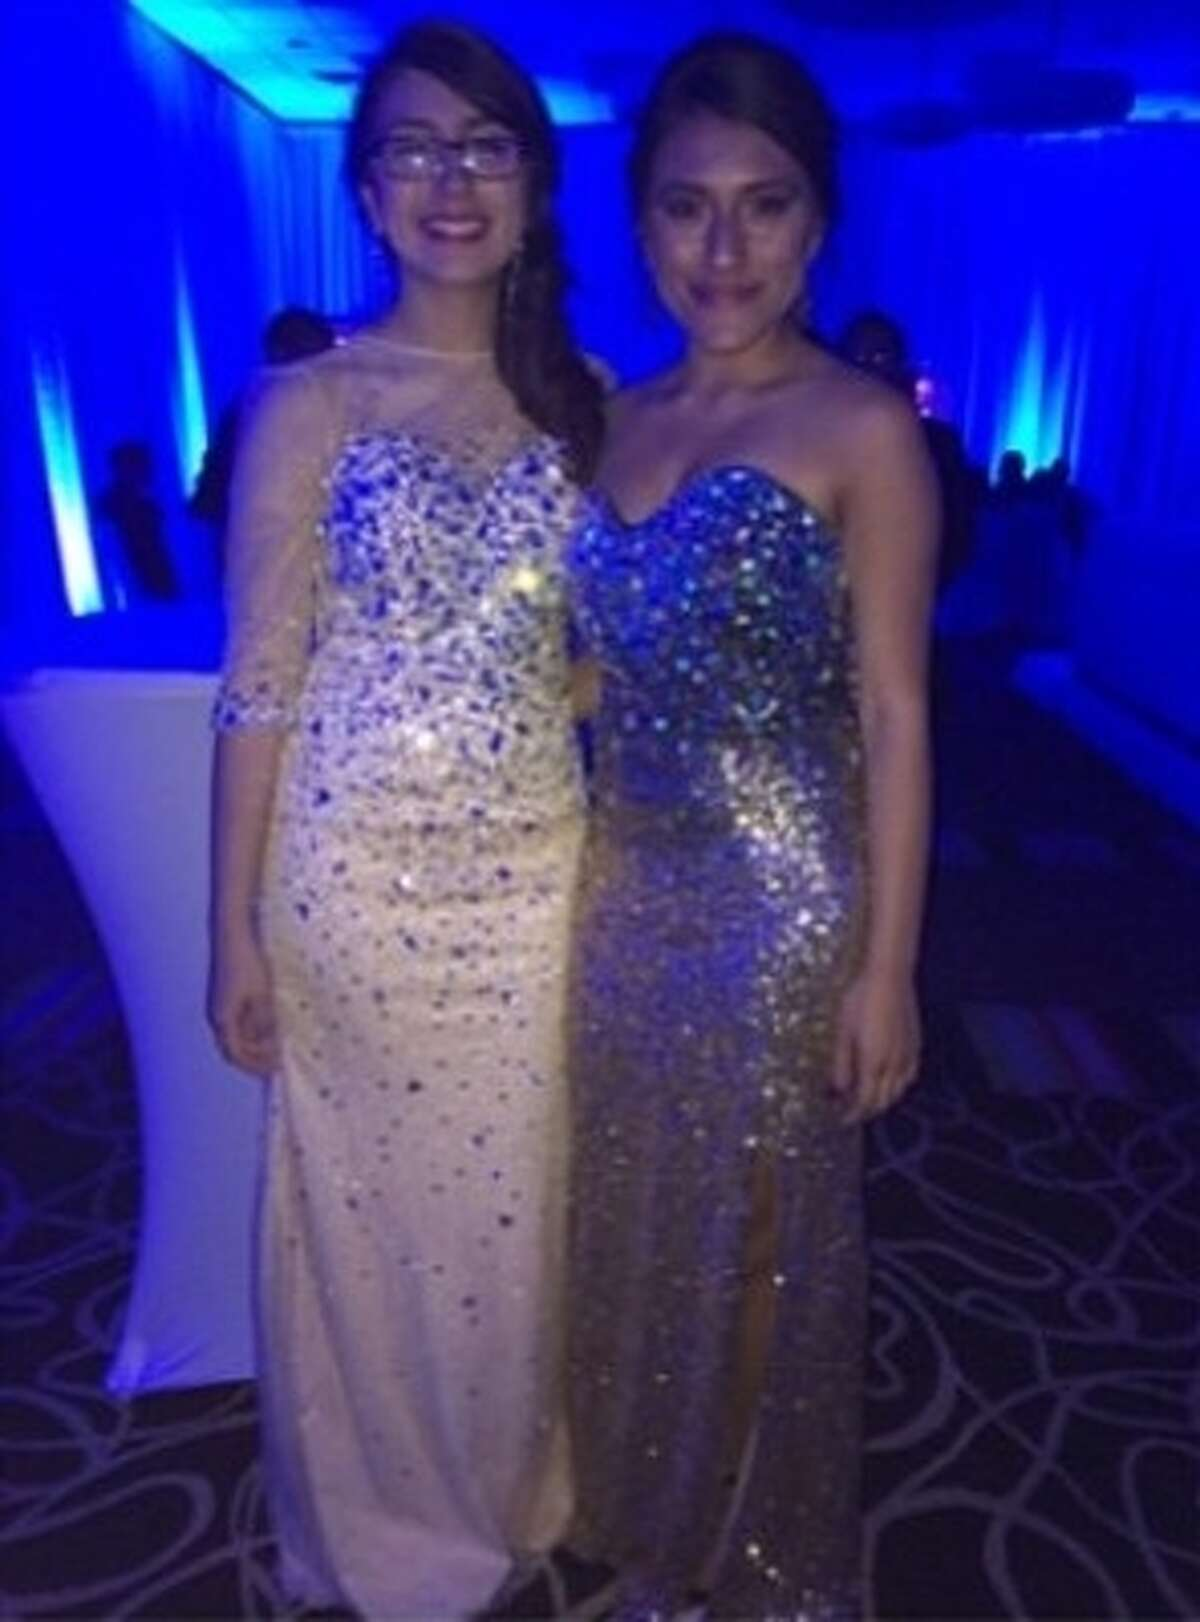 Jackie Gomez (left) was with her friend Justice Gonzalez on prom night.